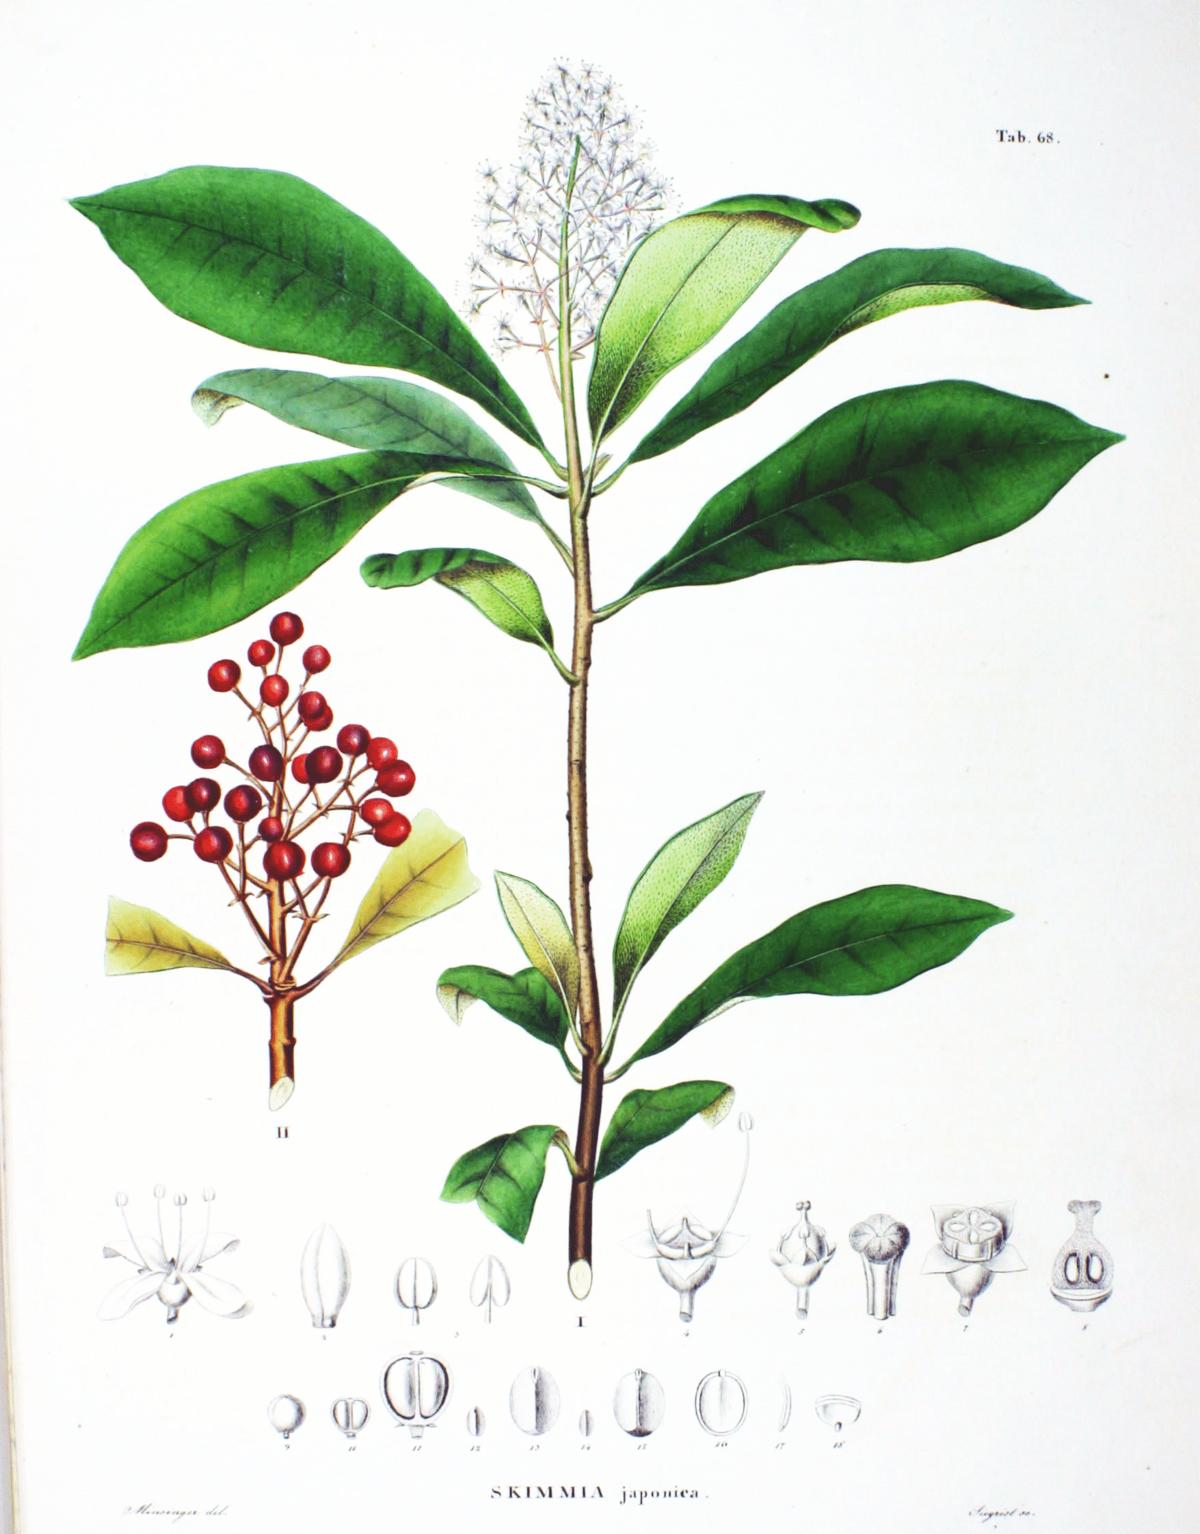 Skimmia japonica wikipedia for Skimmia pianta